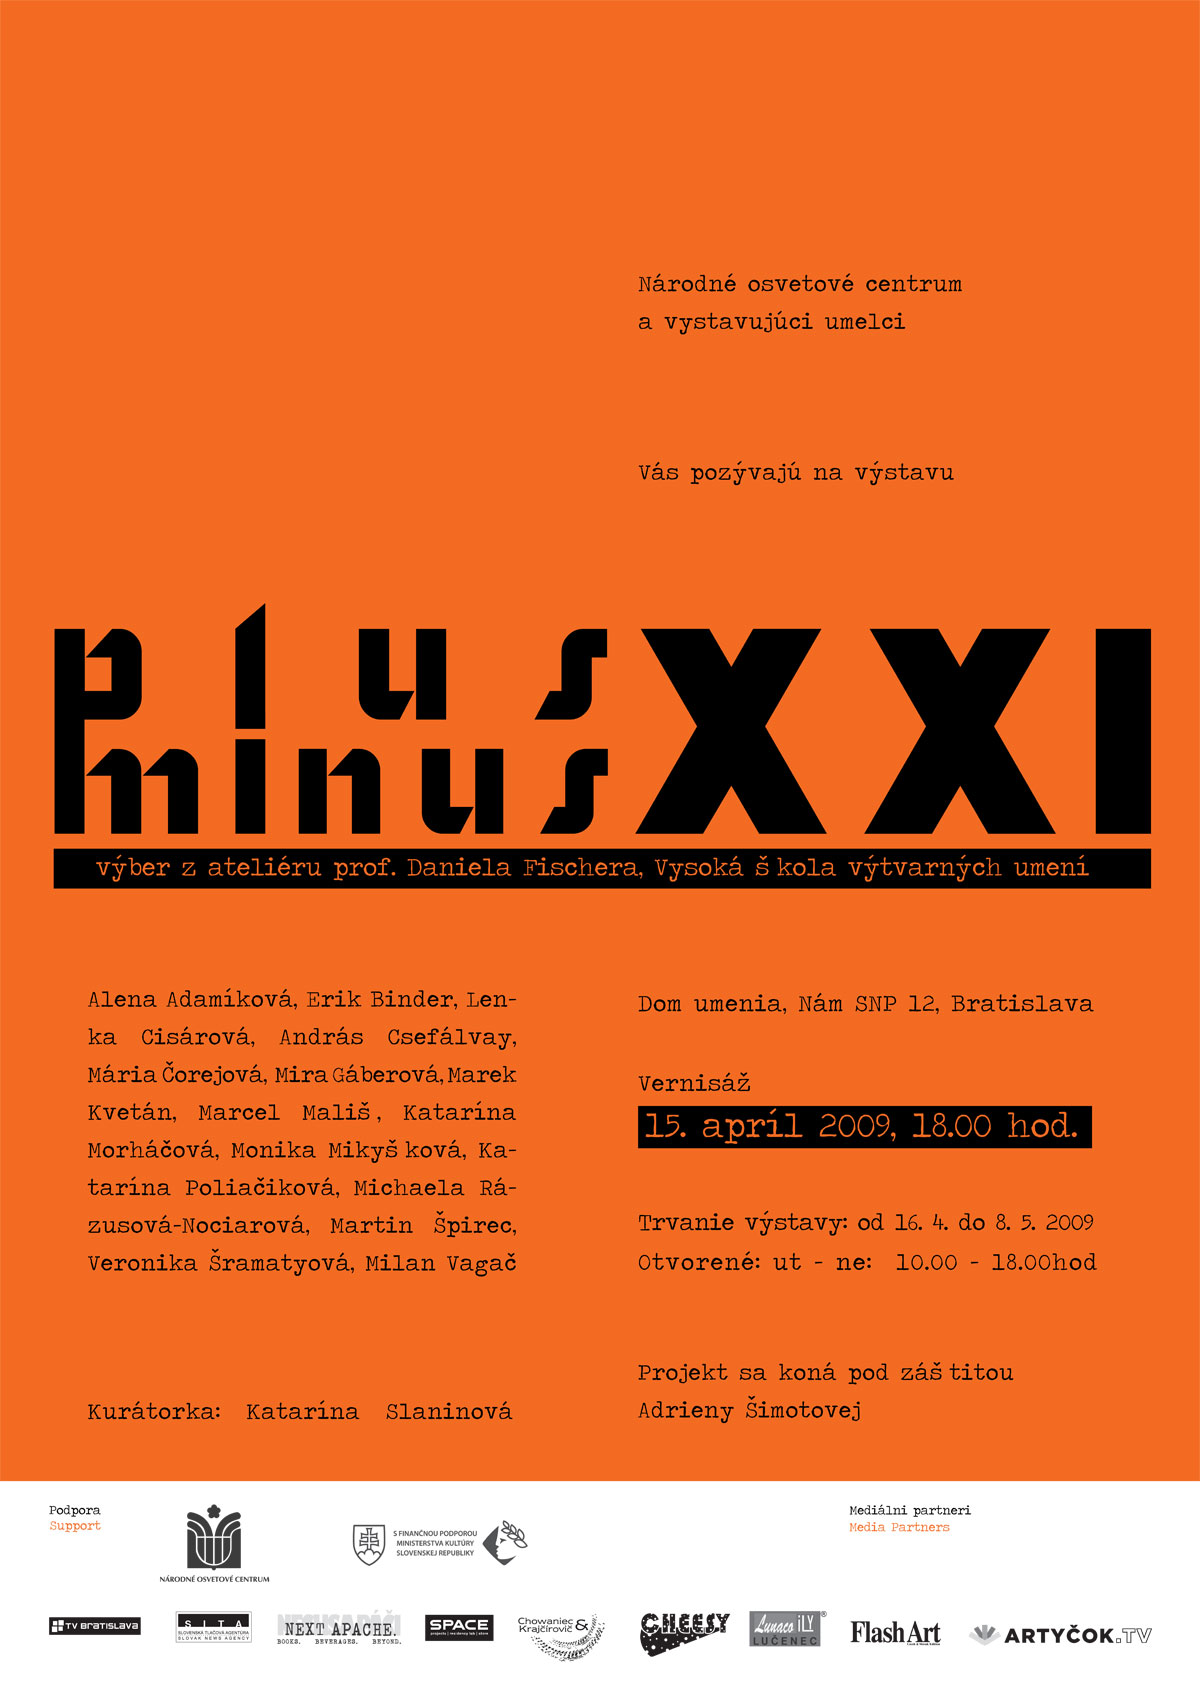 Academy of Fine Arts, Studio+-XXI exhibition visual, 2010